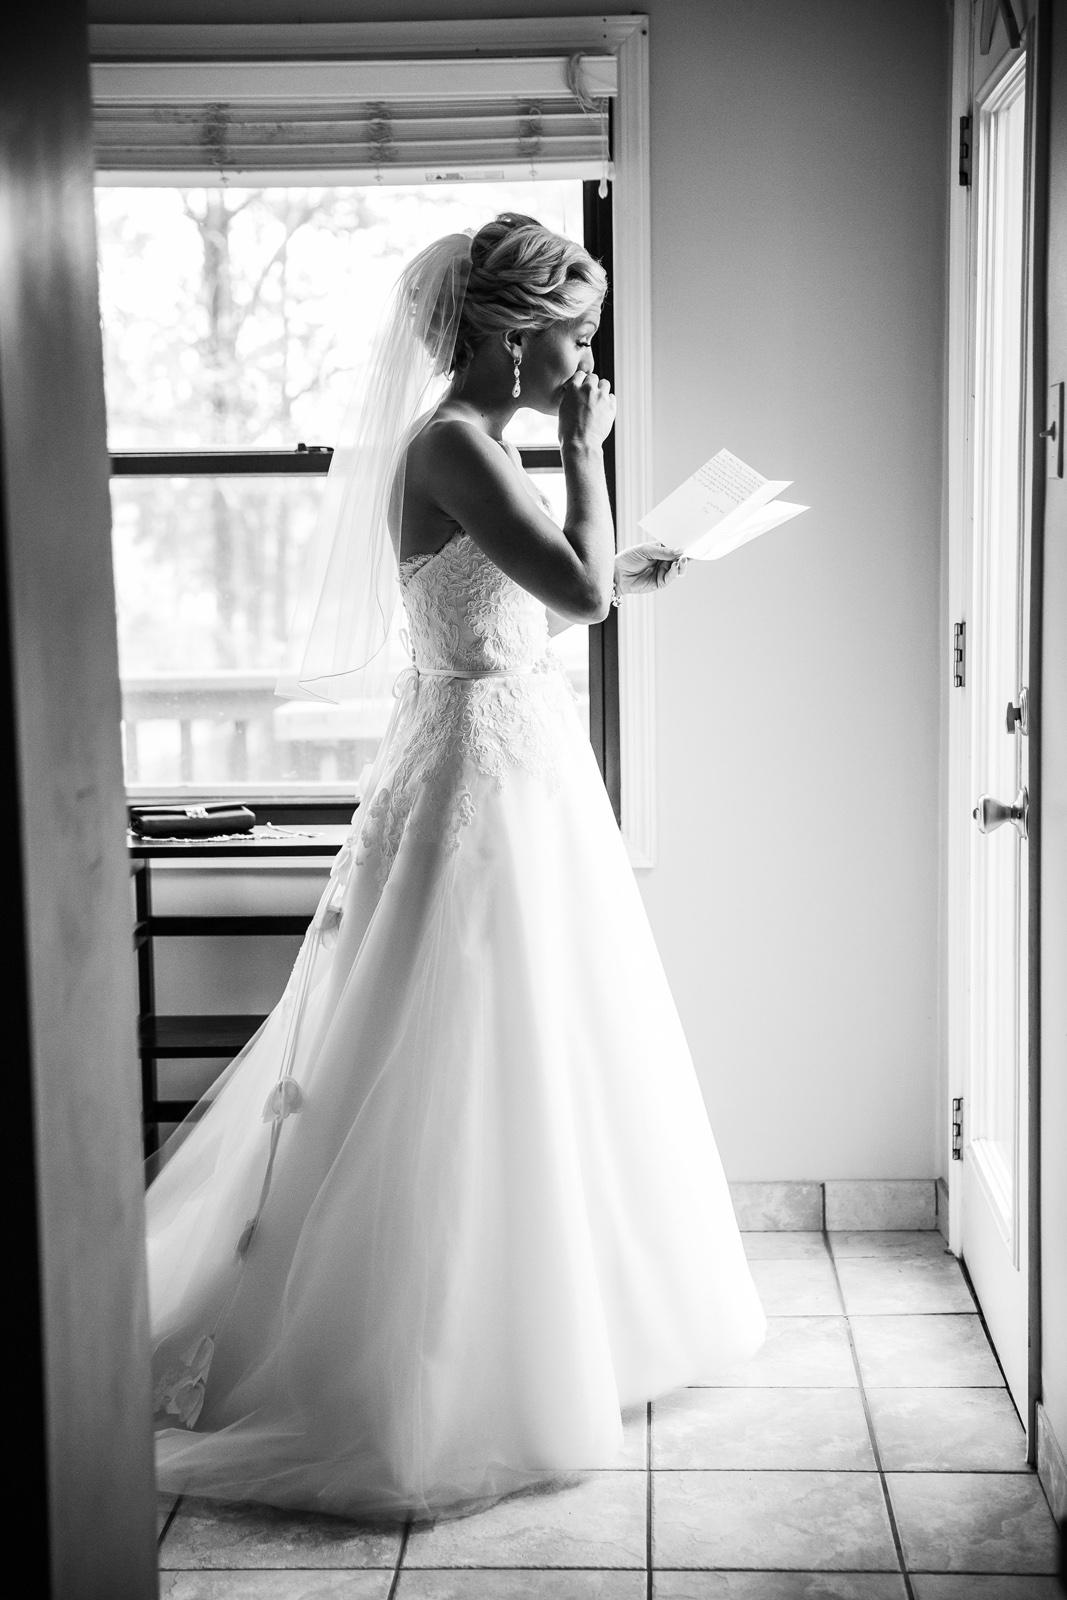 St Louis Winter Wedding Photography_20141115_14104545.jpg